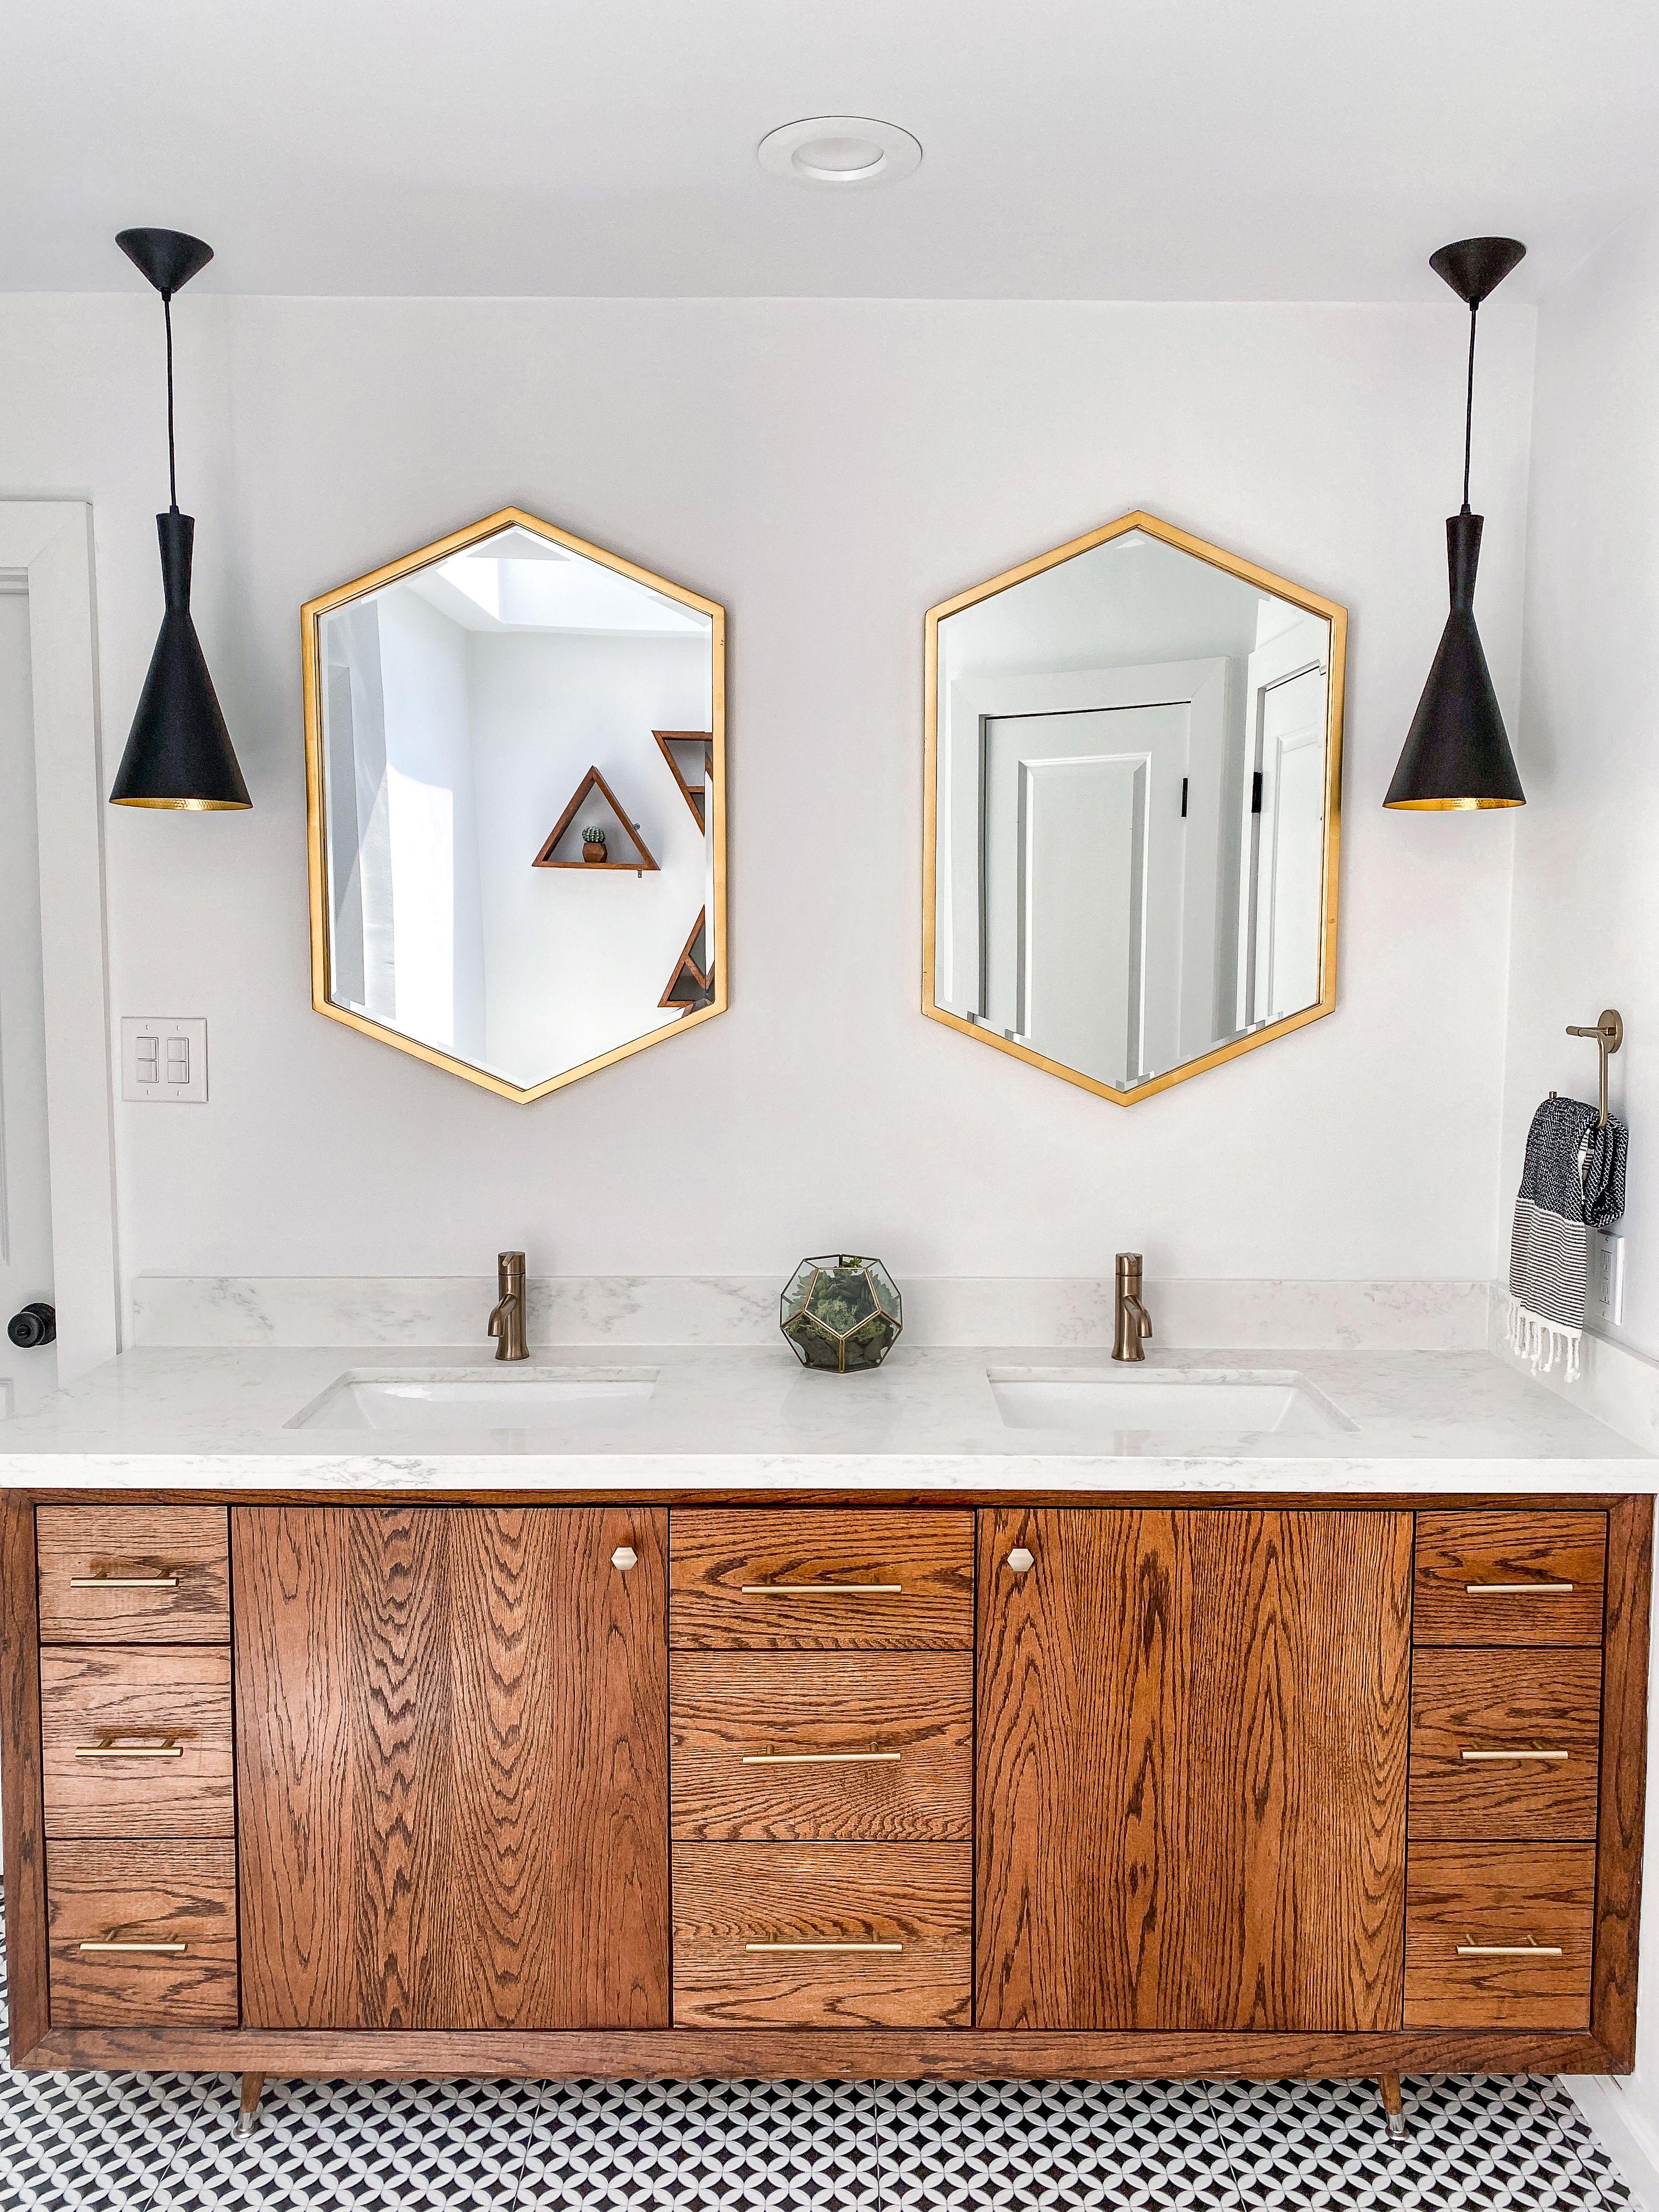 Mid Mod Vanity Remodeled 80s Bathroom Mid Century Modern Bathroom Modern Bathroom Mirrors Modern Bathroom Decor [ 4032 x 3024 Pixel ]